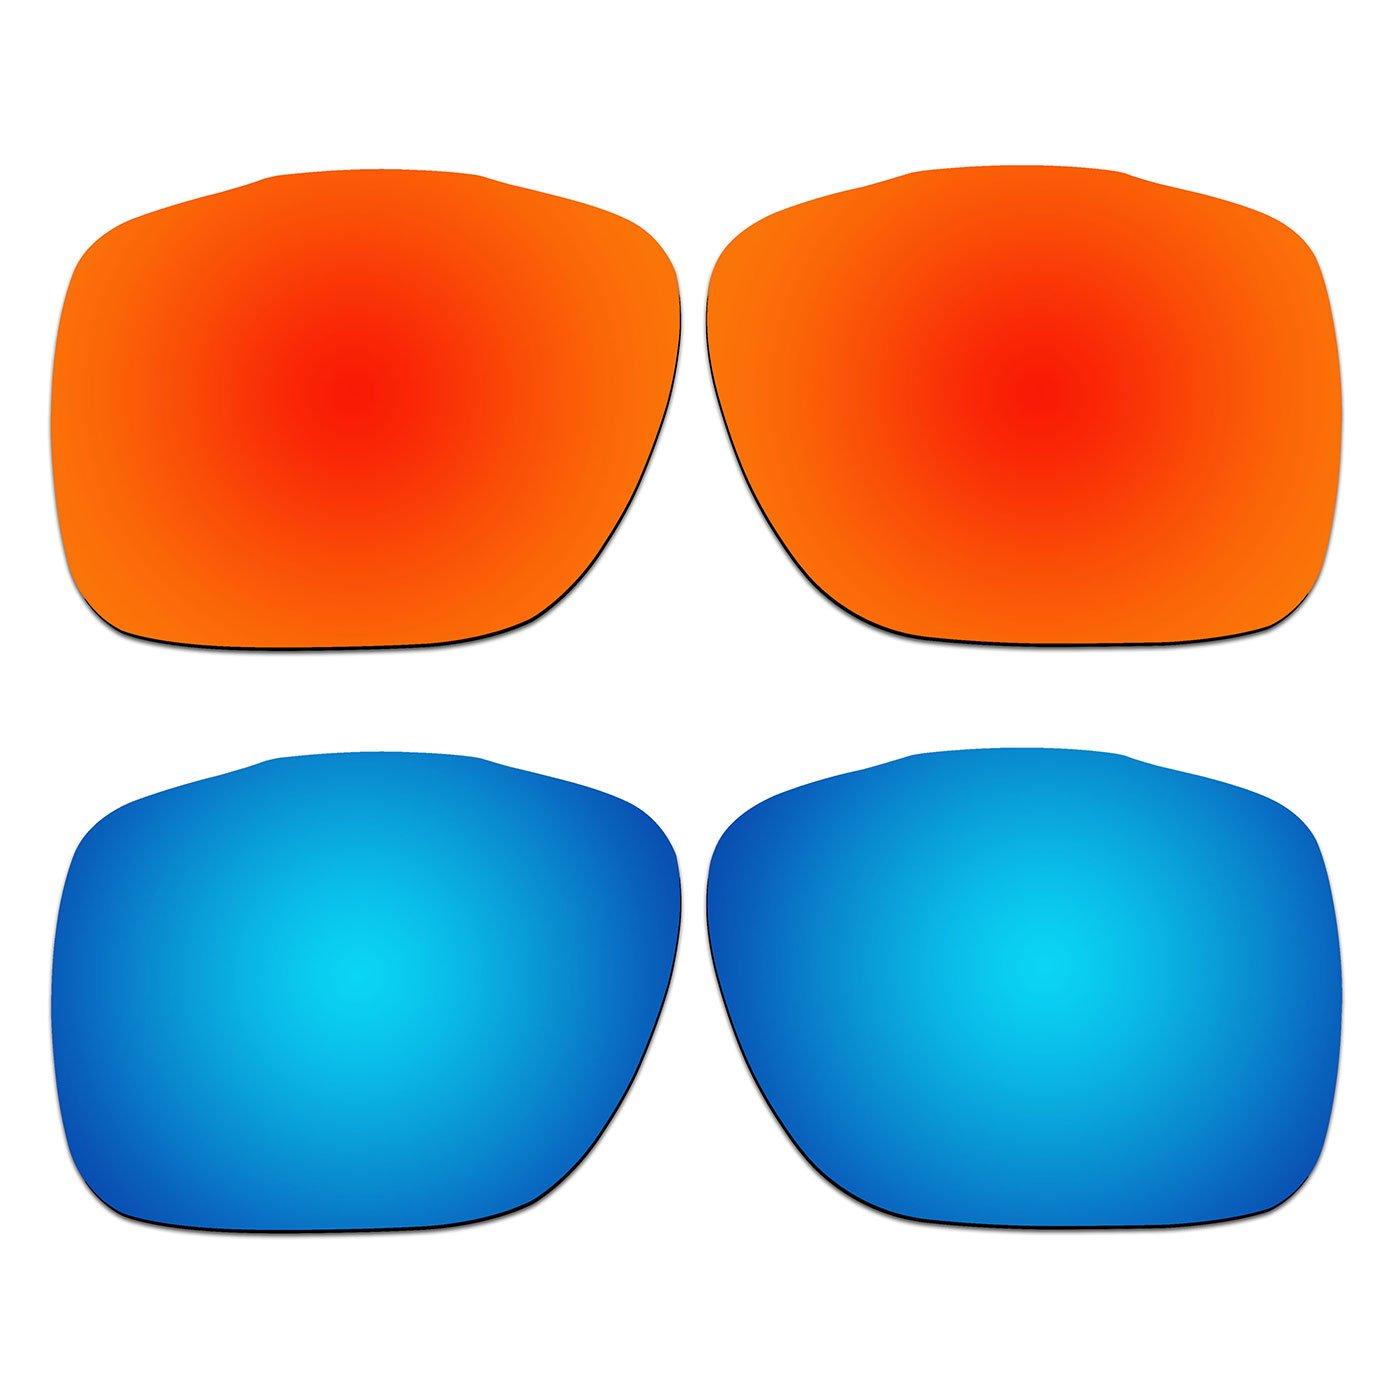 aCompatible 2 Par lentes polarizadas de recambio para Oakley ...